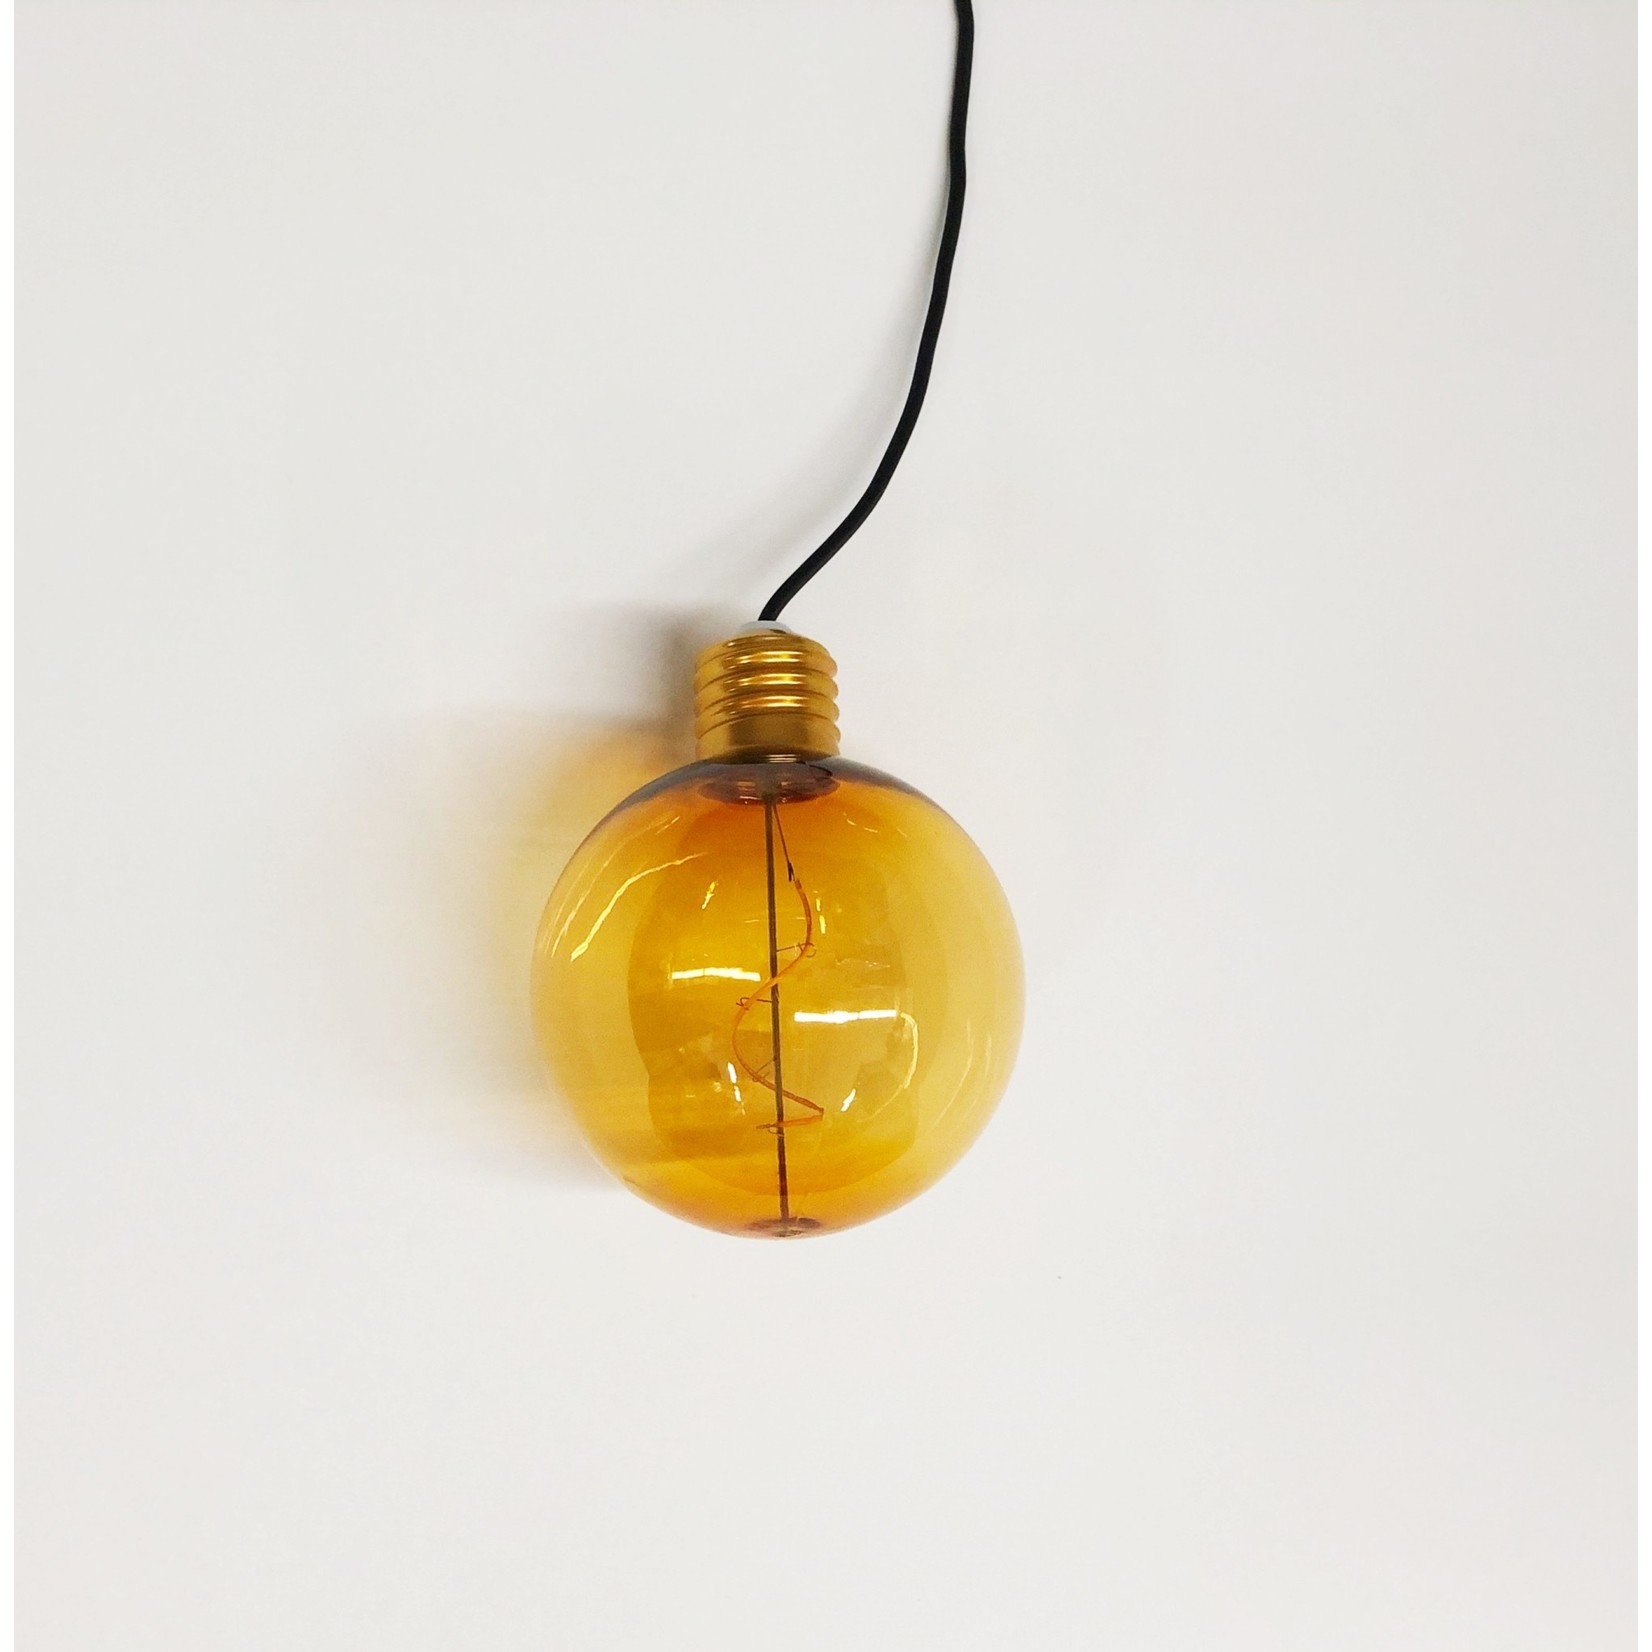 Hanging Gazebo Edison LED Light String